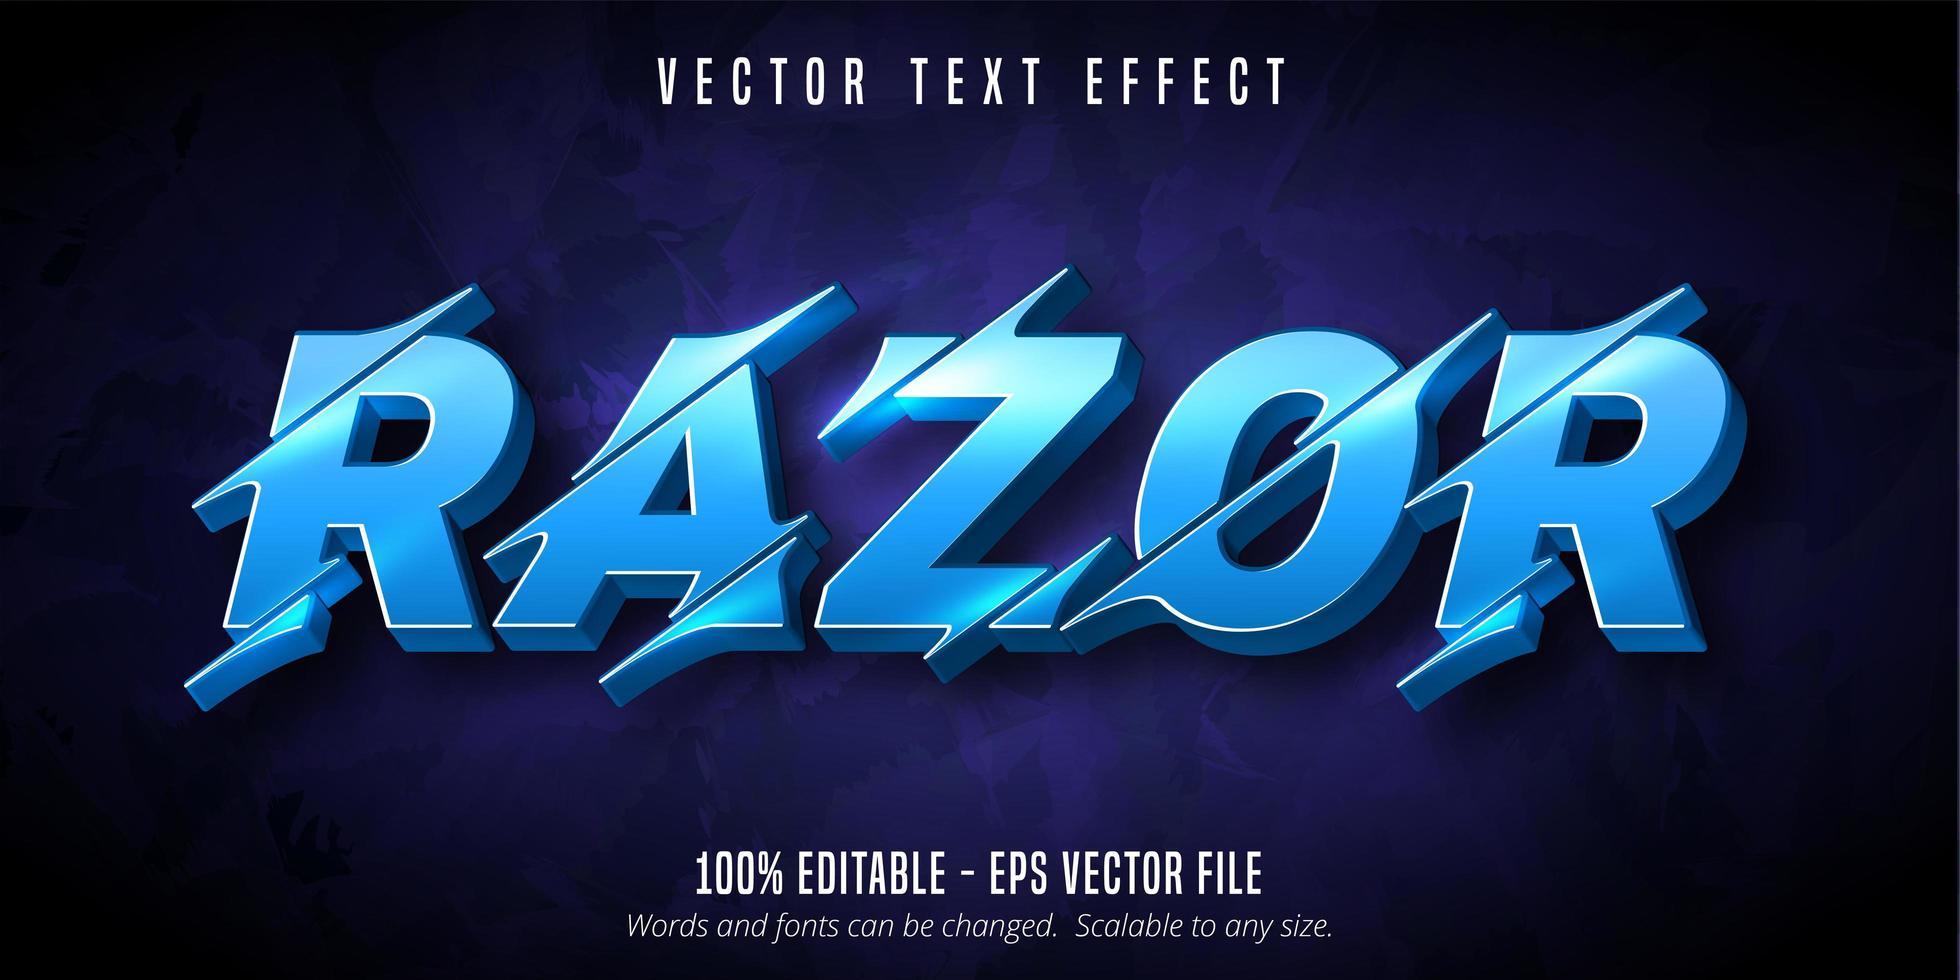 navalha iluminado efeito de texto estilo fatiado azul vetor